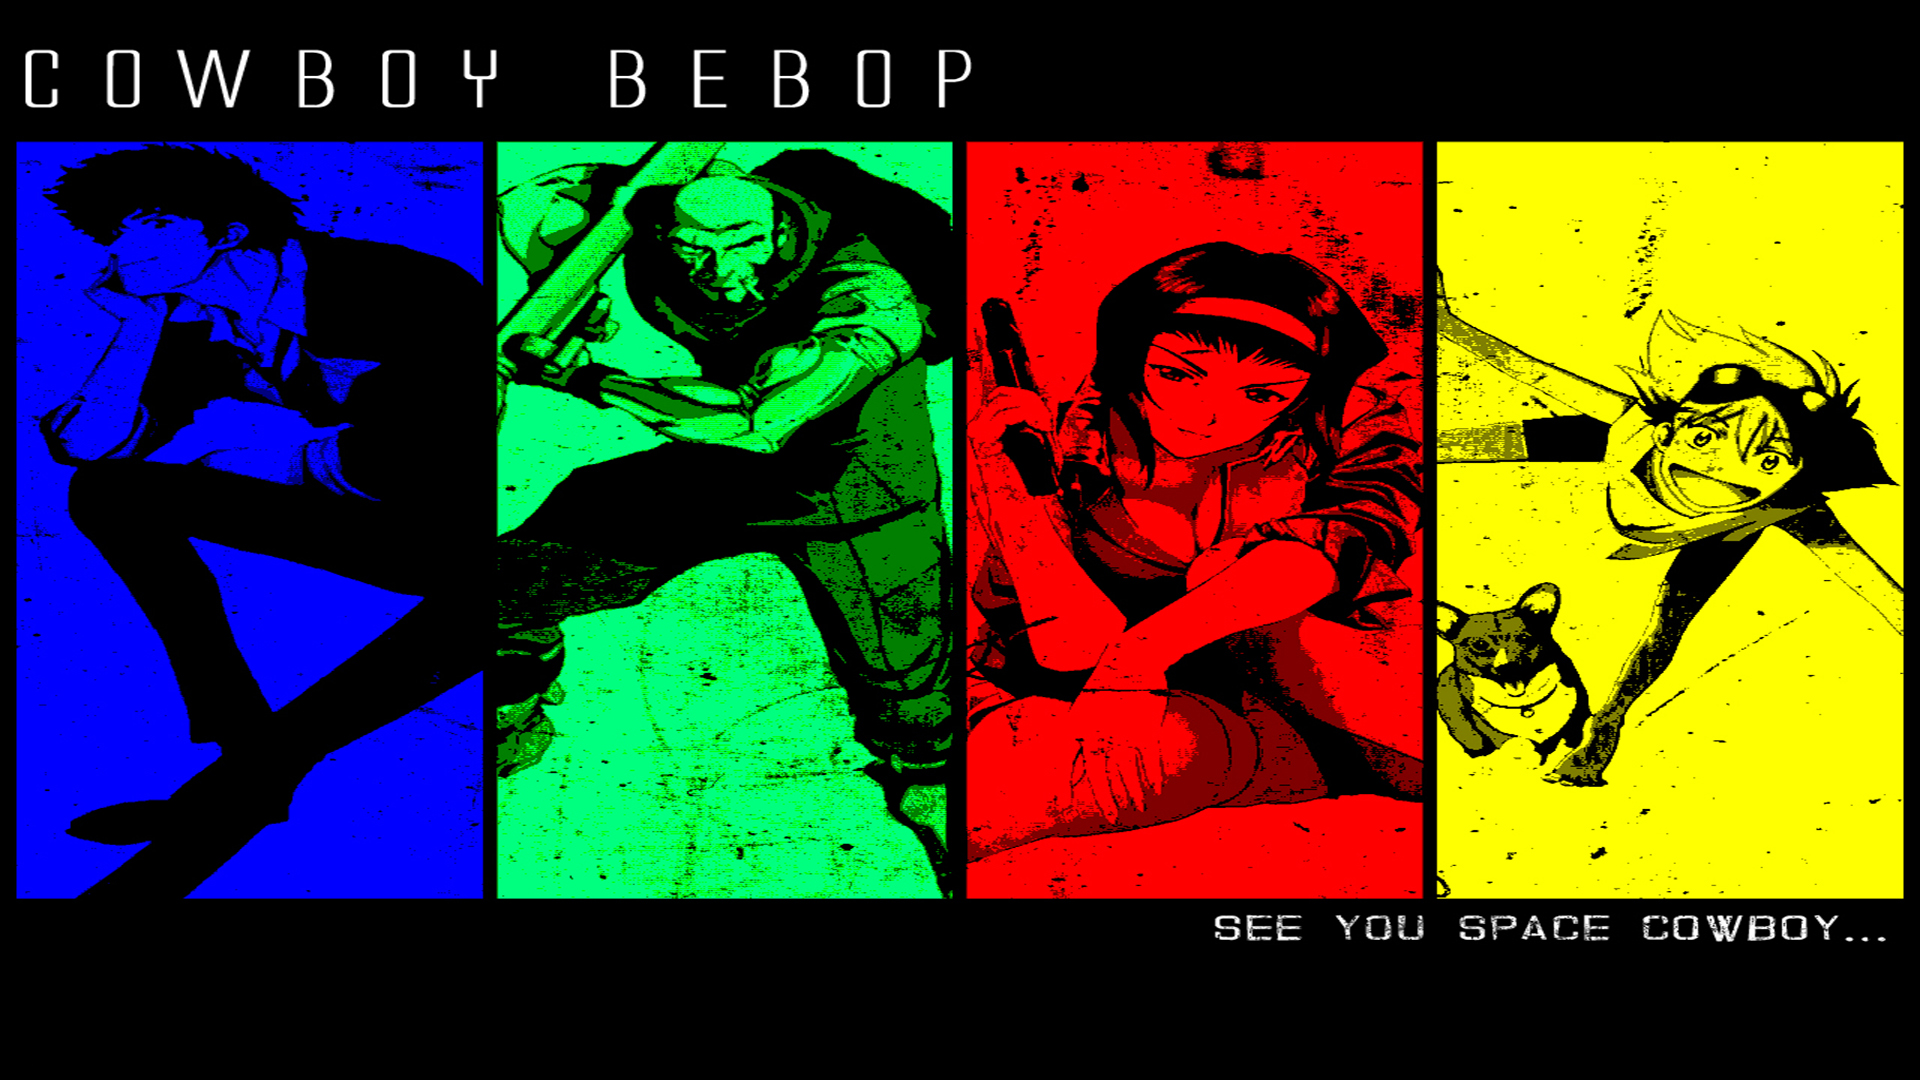 wallpapers of Cowboy Bebop You are downloading Cowboy Bebop wallpaper 1920x1080